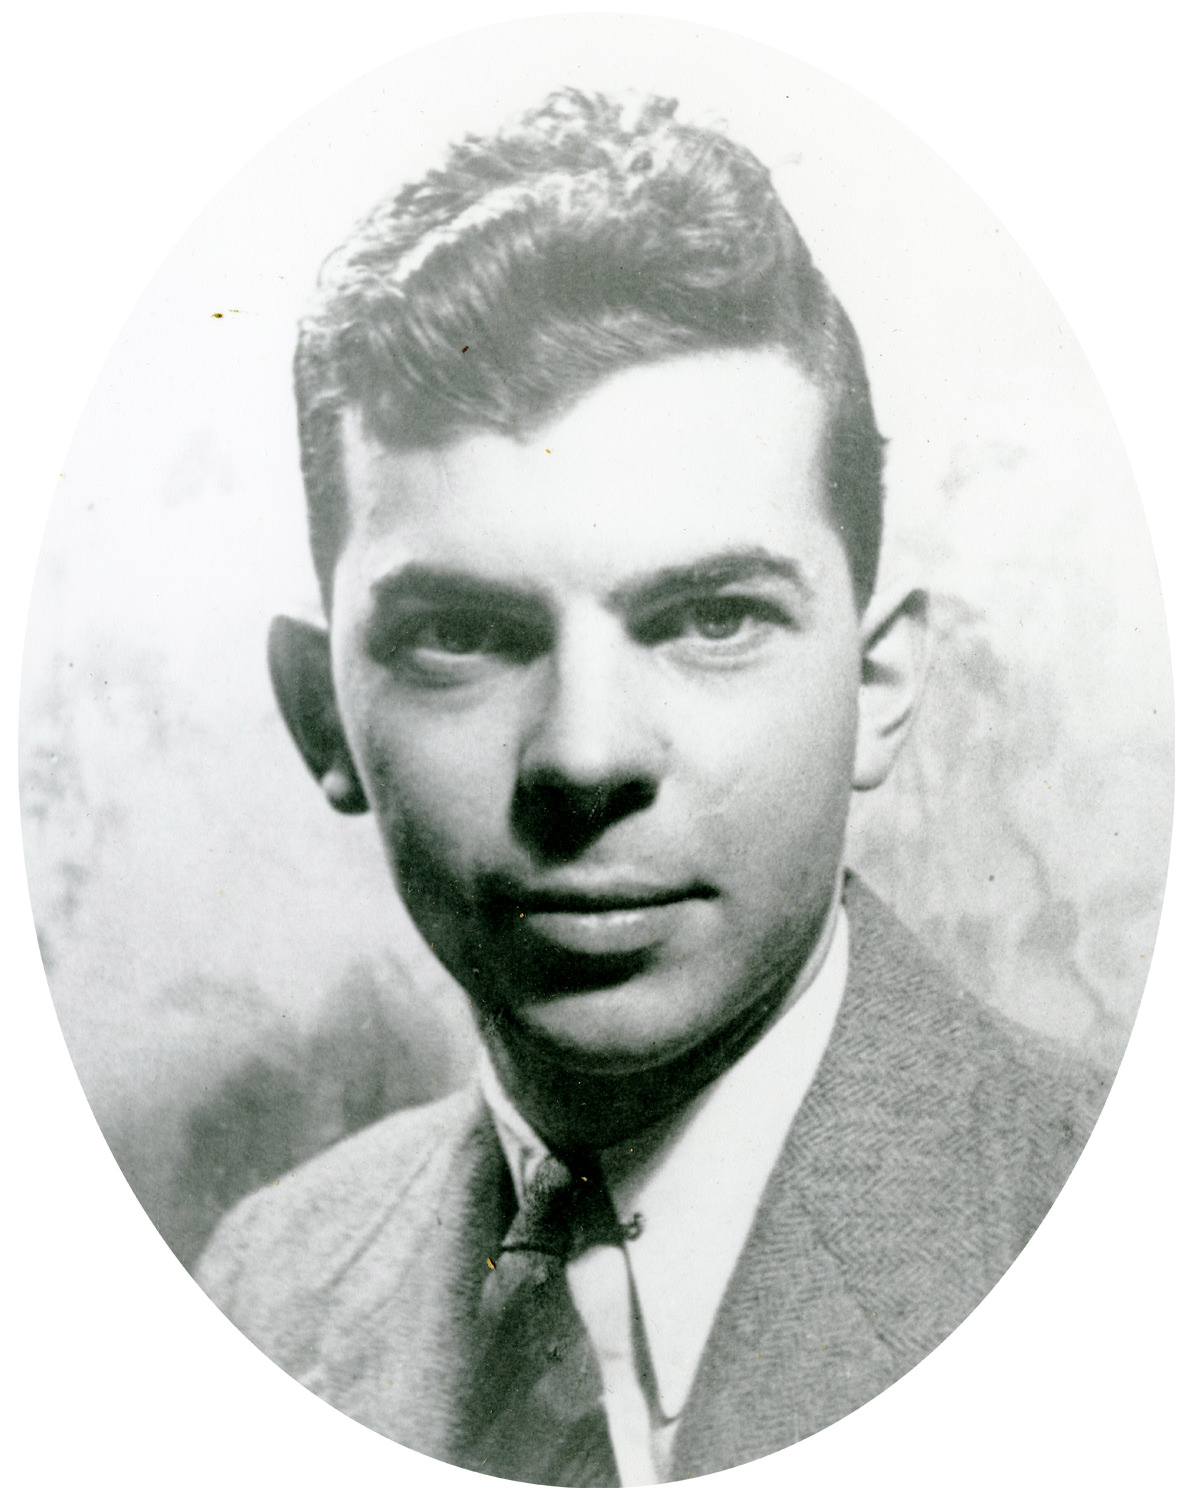 Frank-Teagle-Portrait.jpg